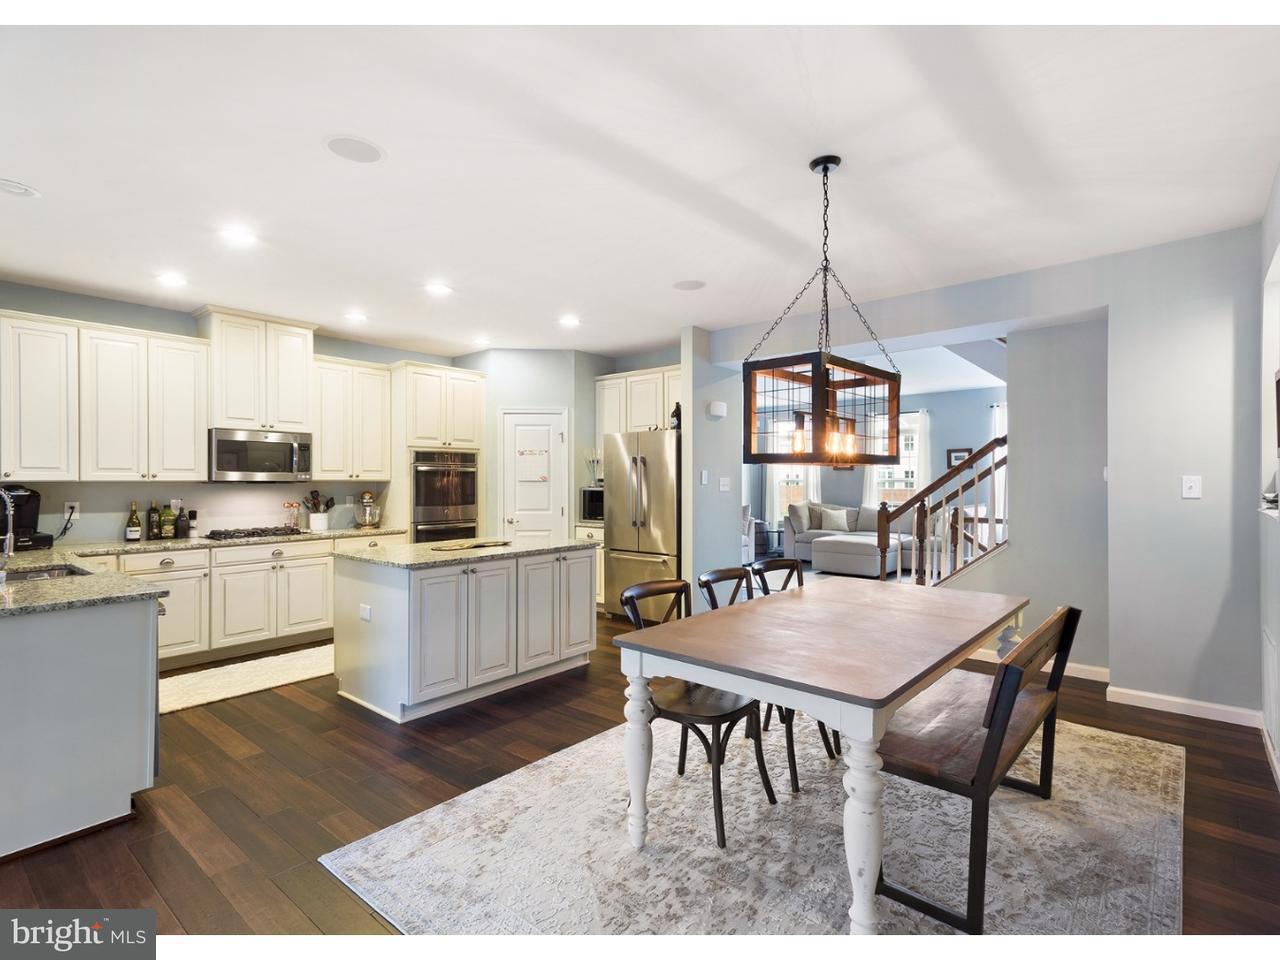 联栋屋 为 销售 在 47 ISABELLE Court Evesham Twp, 新泽西州 08053 美国